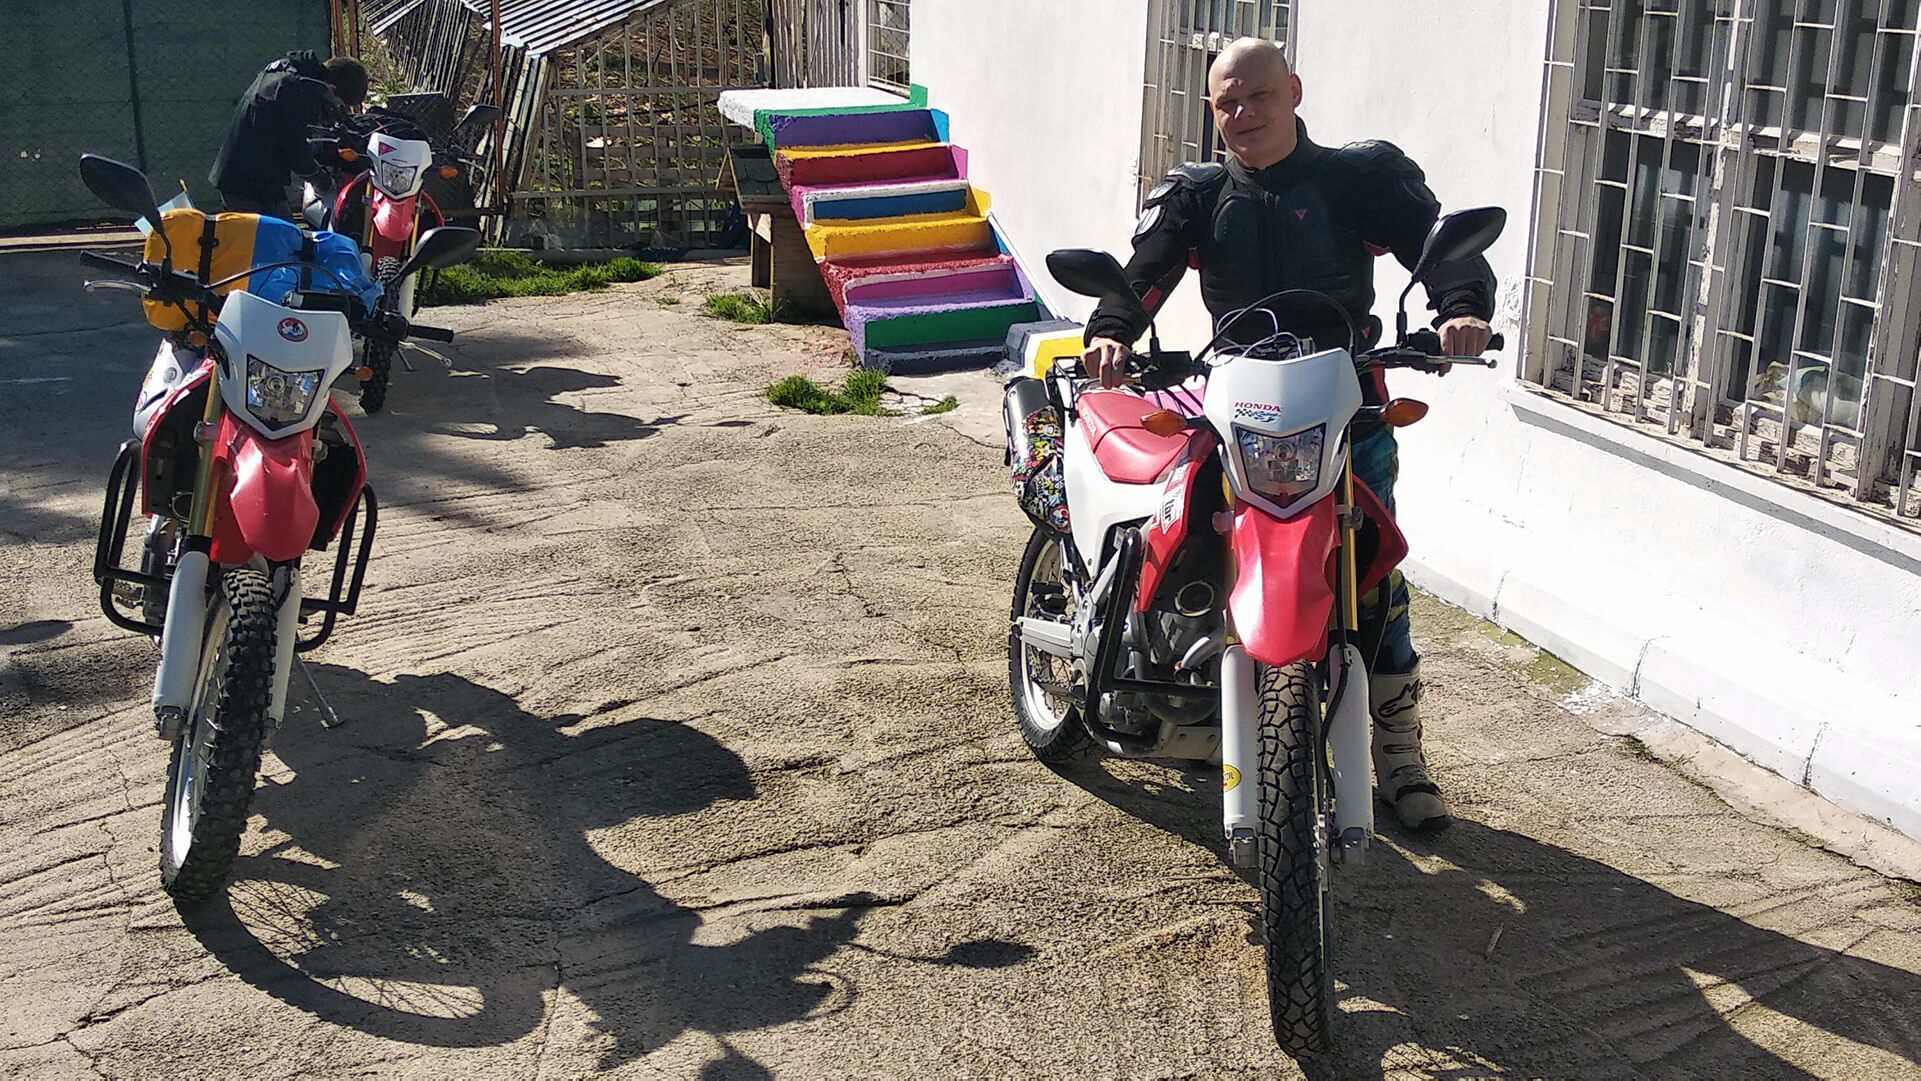 Moto Pilgrims Rental Point